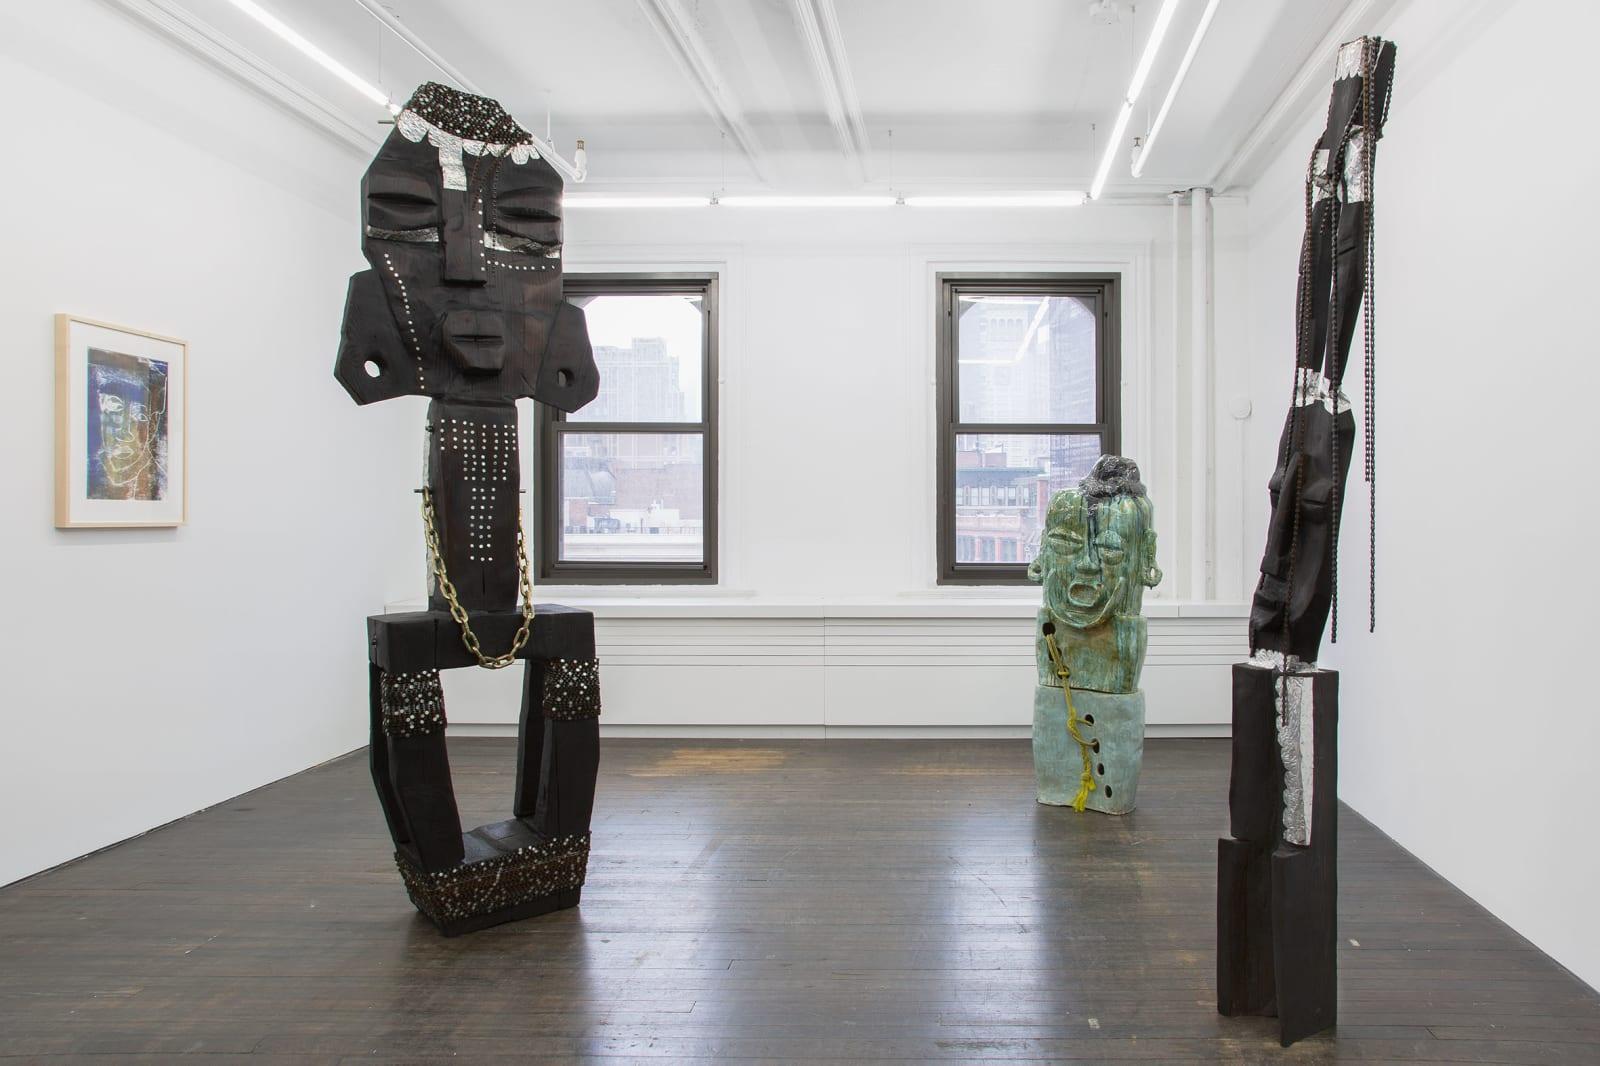 <p>Installation view: 'Ebika Bya ba Kuchu mu Buganda (Kuchu Clans of Buganda)', Gordon Robichaux, New York, NY (2020).<span>Photo by Gregory Carideo.</span></p>